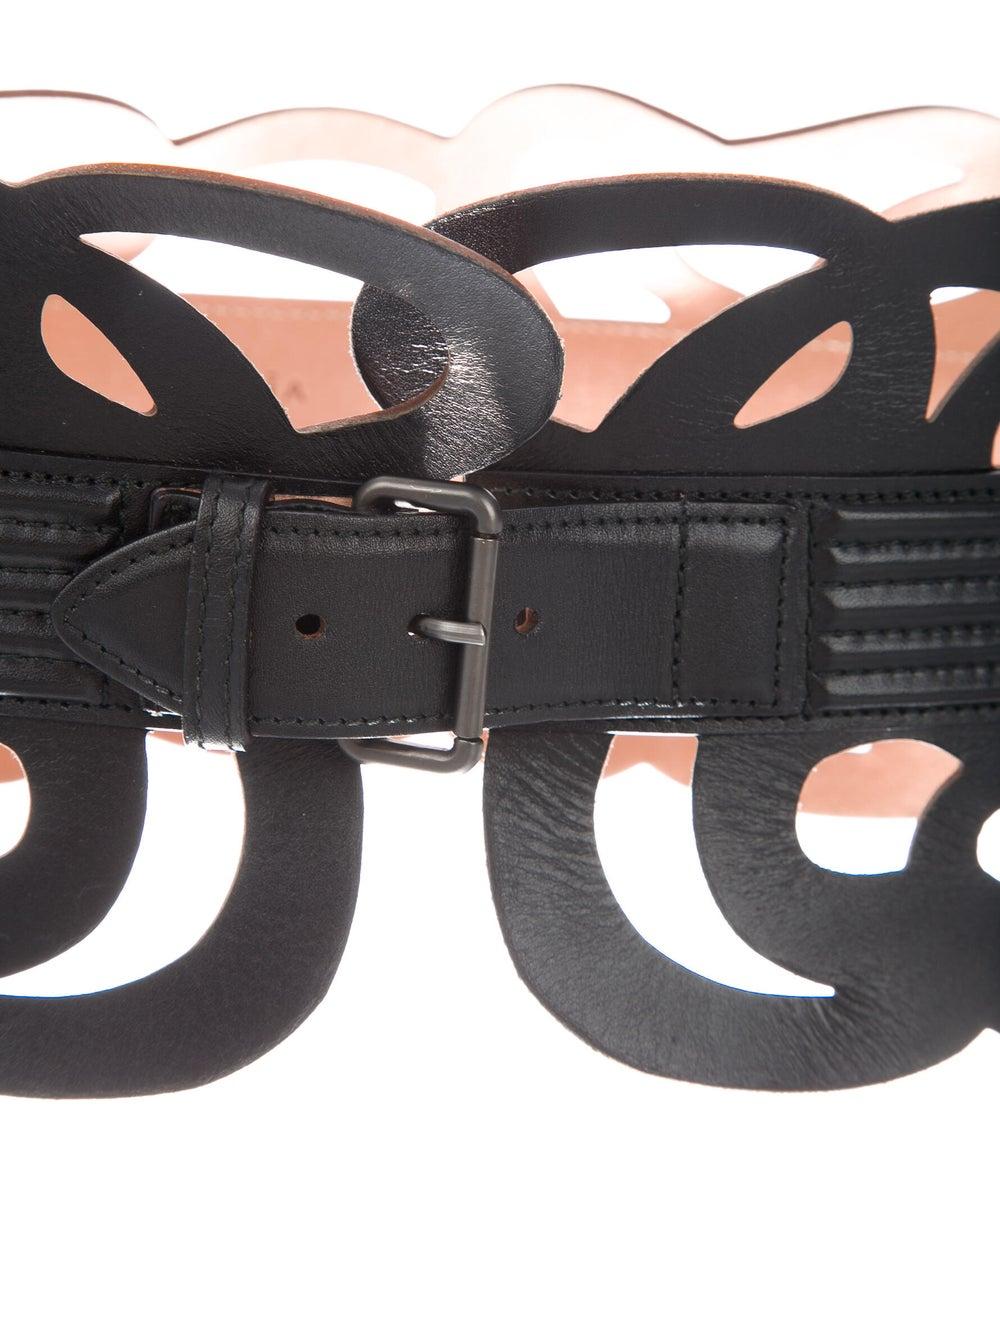 Alaïa Leather Waist Belt Black - image 2